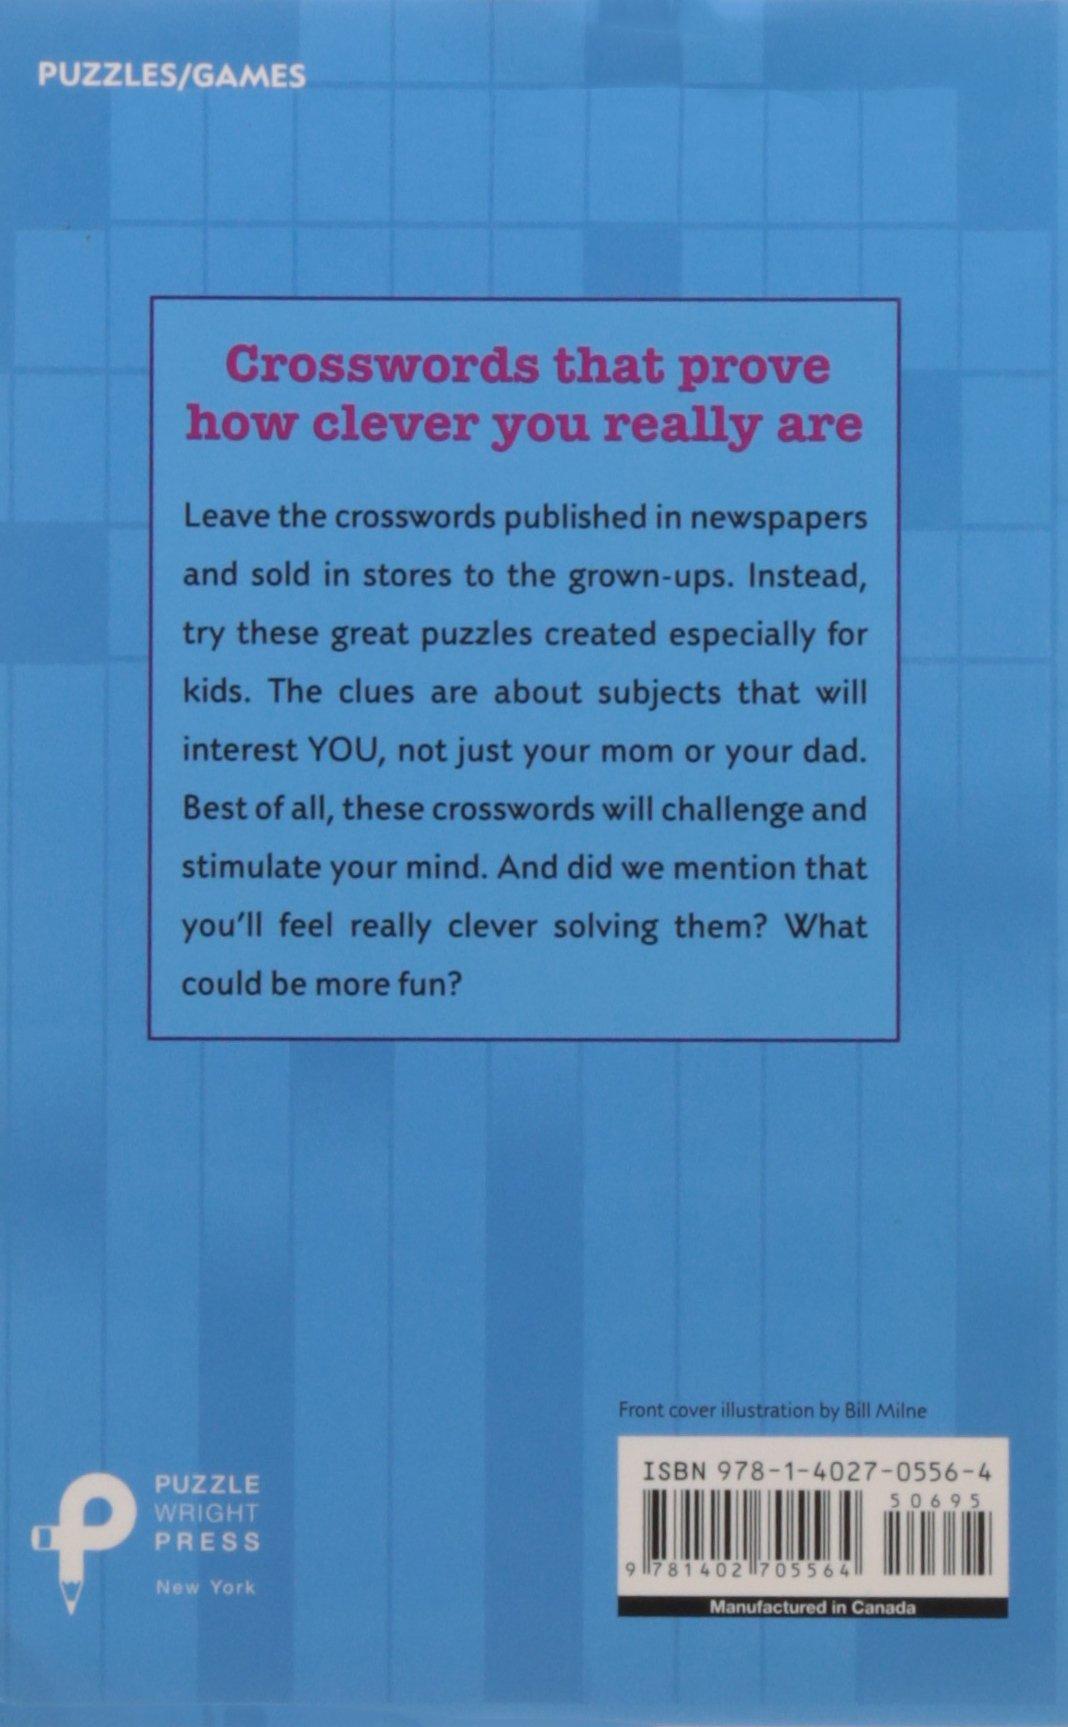 Clever Crosswords for Kids